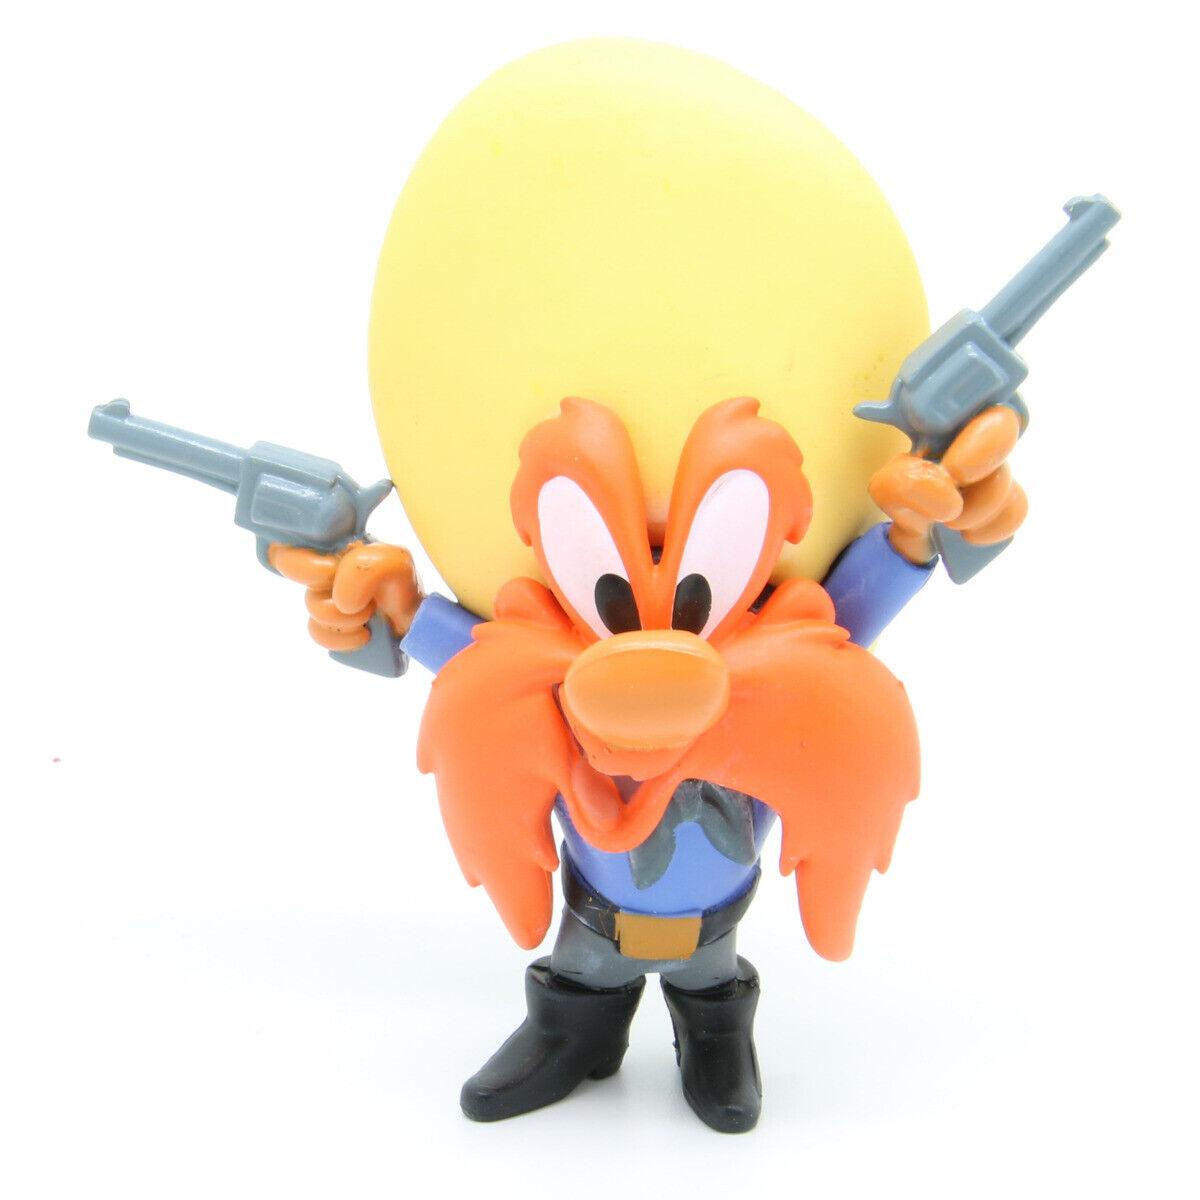 Diverdeimentoko Mystery Minis Saturday Morning autotoons Warner Bros -  Yosemite Sam giocattoli...  più economico